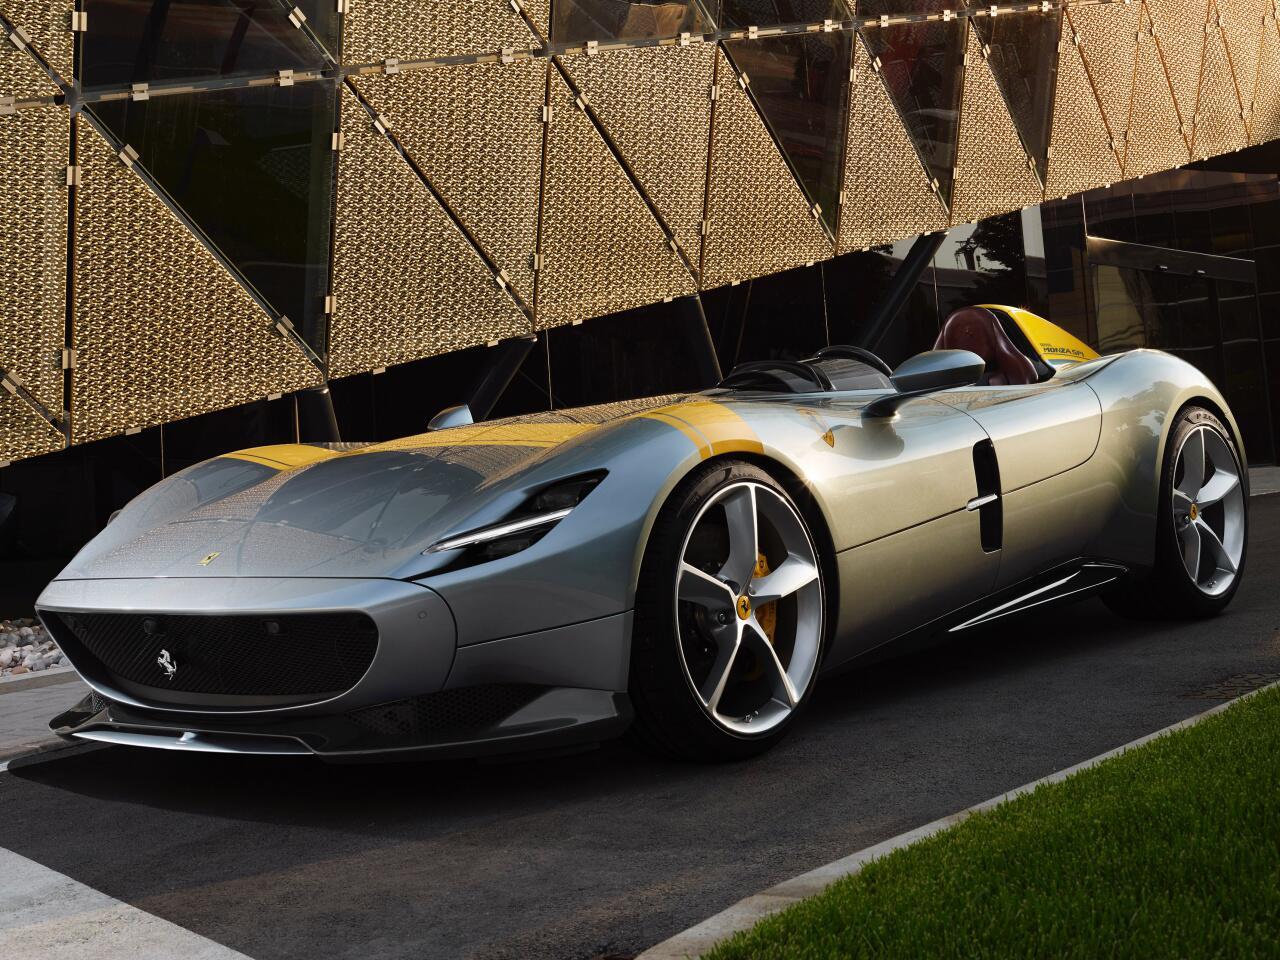 Bild zu Ferrari Monza SP1 und SP2: Radikale Retro-Sportwagen feiern Premiere